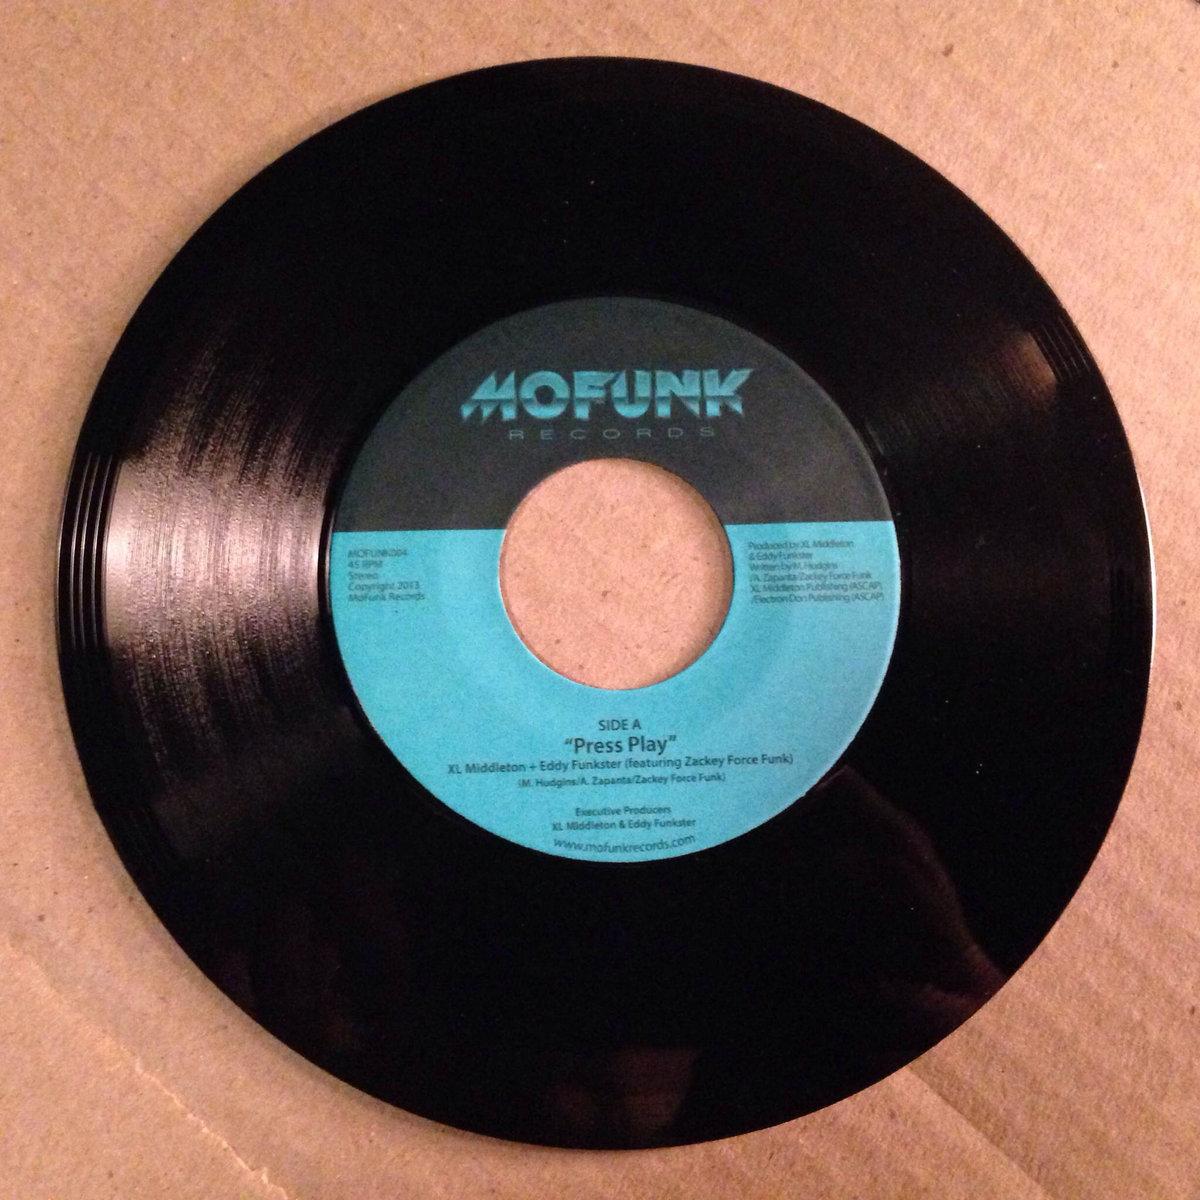 Press Play (feat  Zackey Force Funk) / Super Gorilla